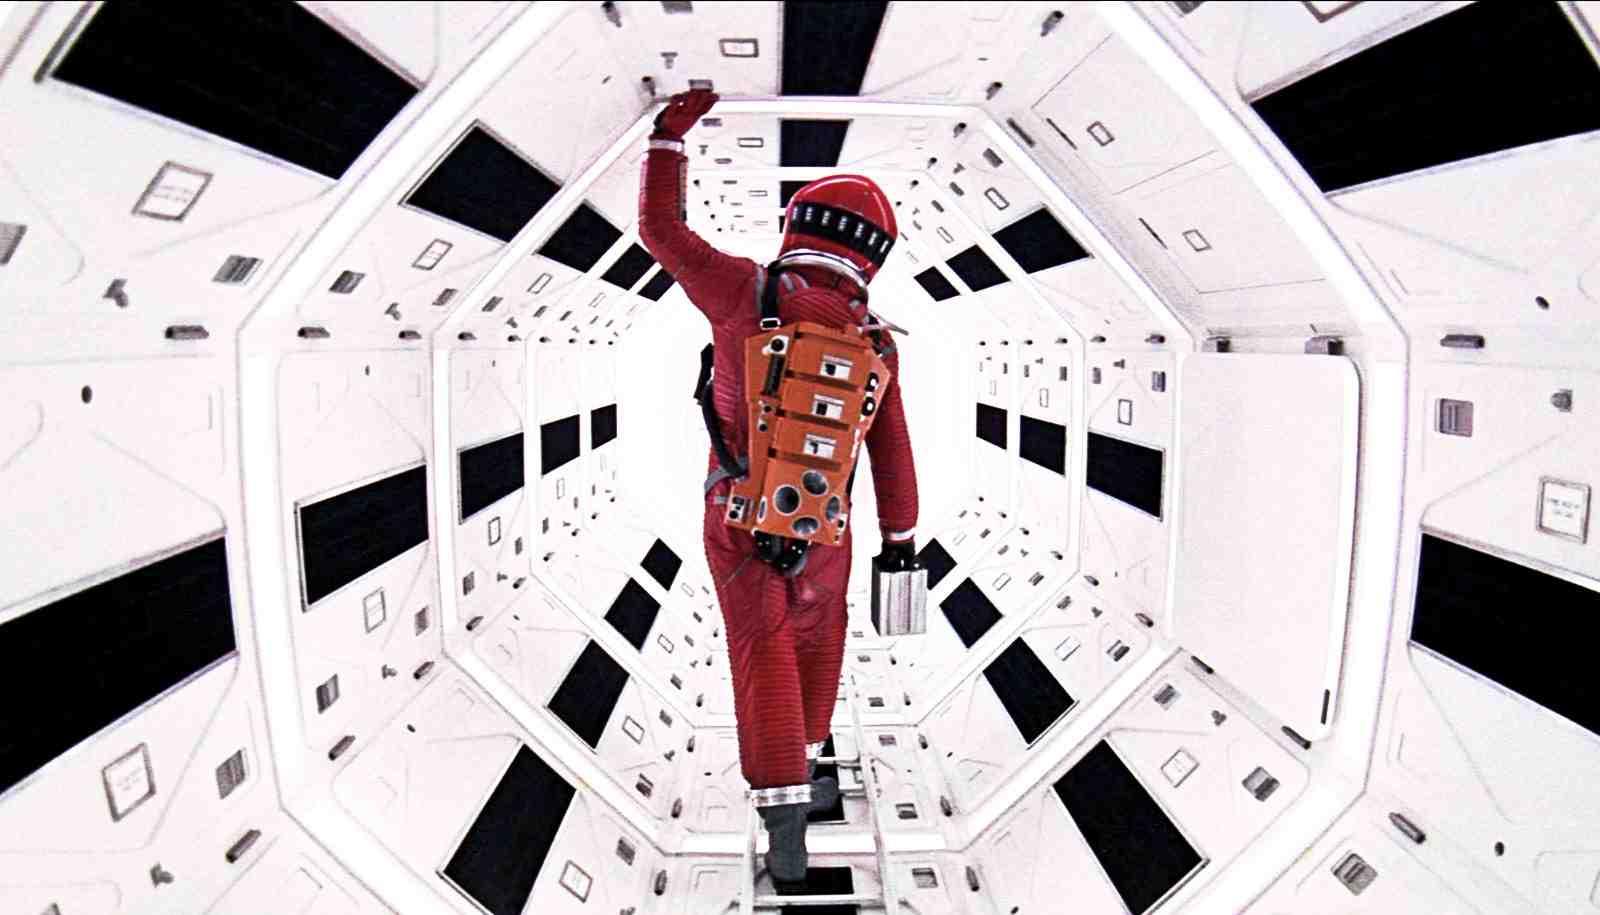 2001-a-space-odyssey-stanley-kubrick